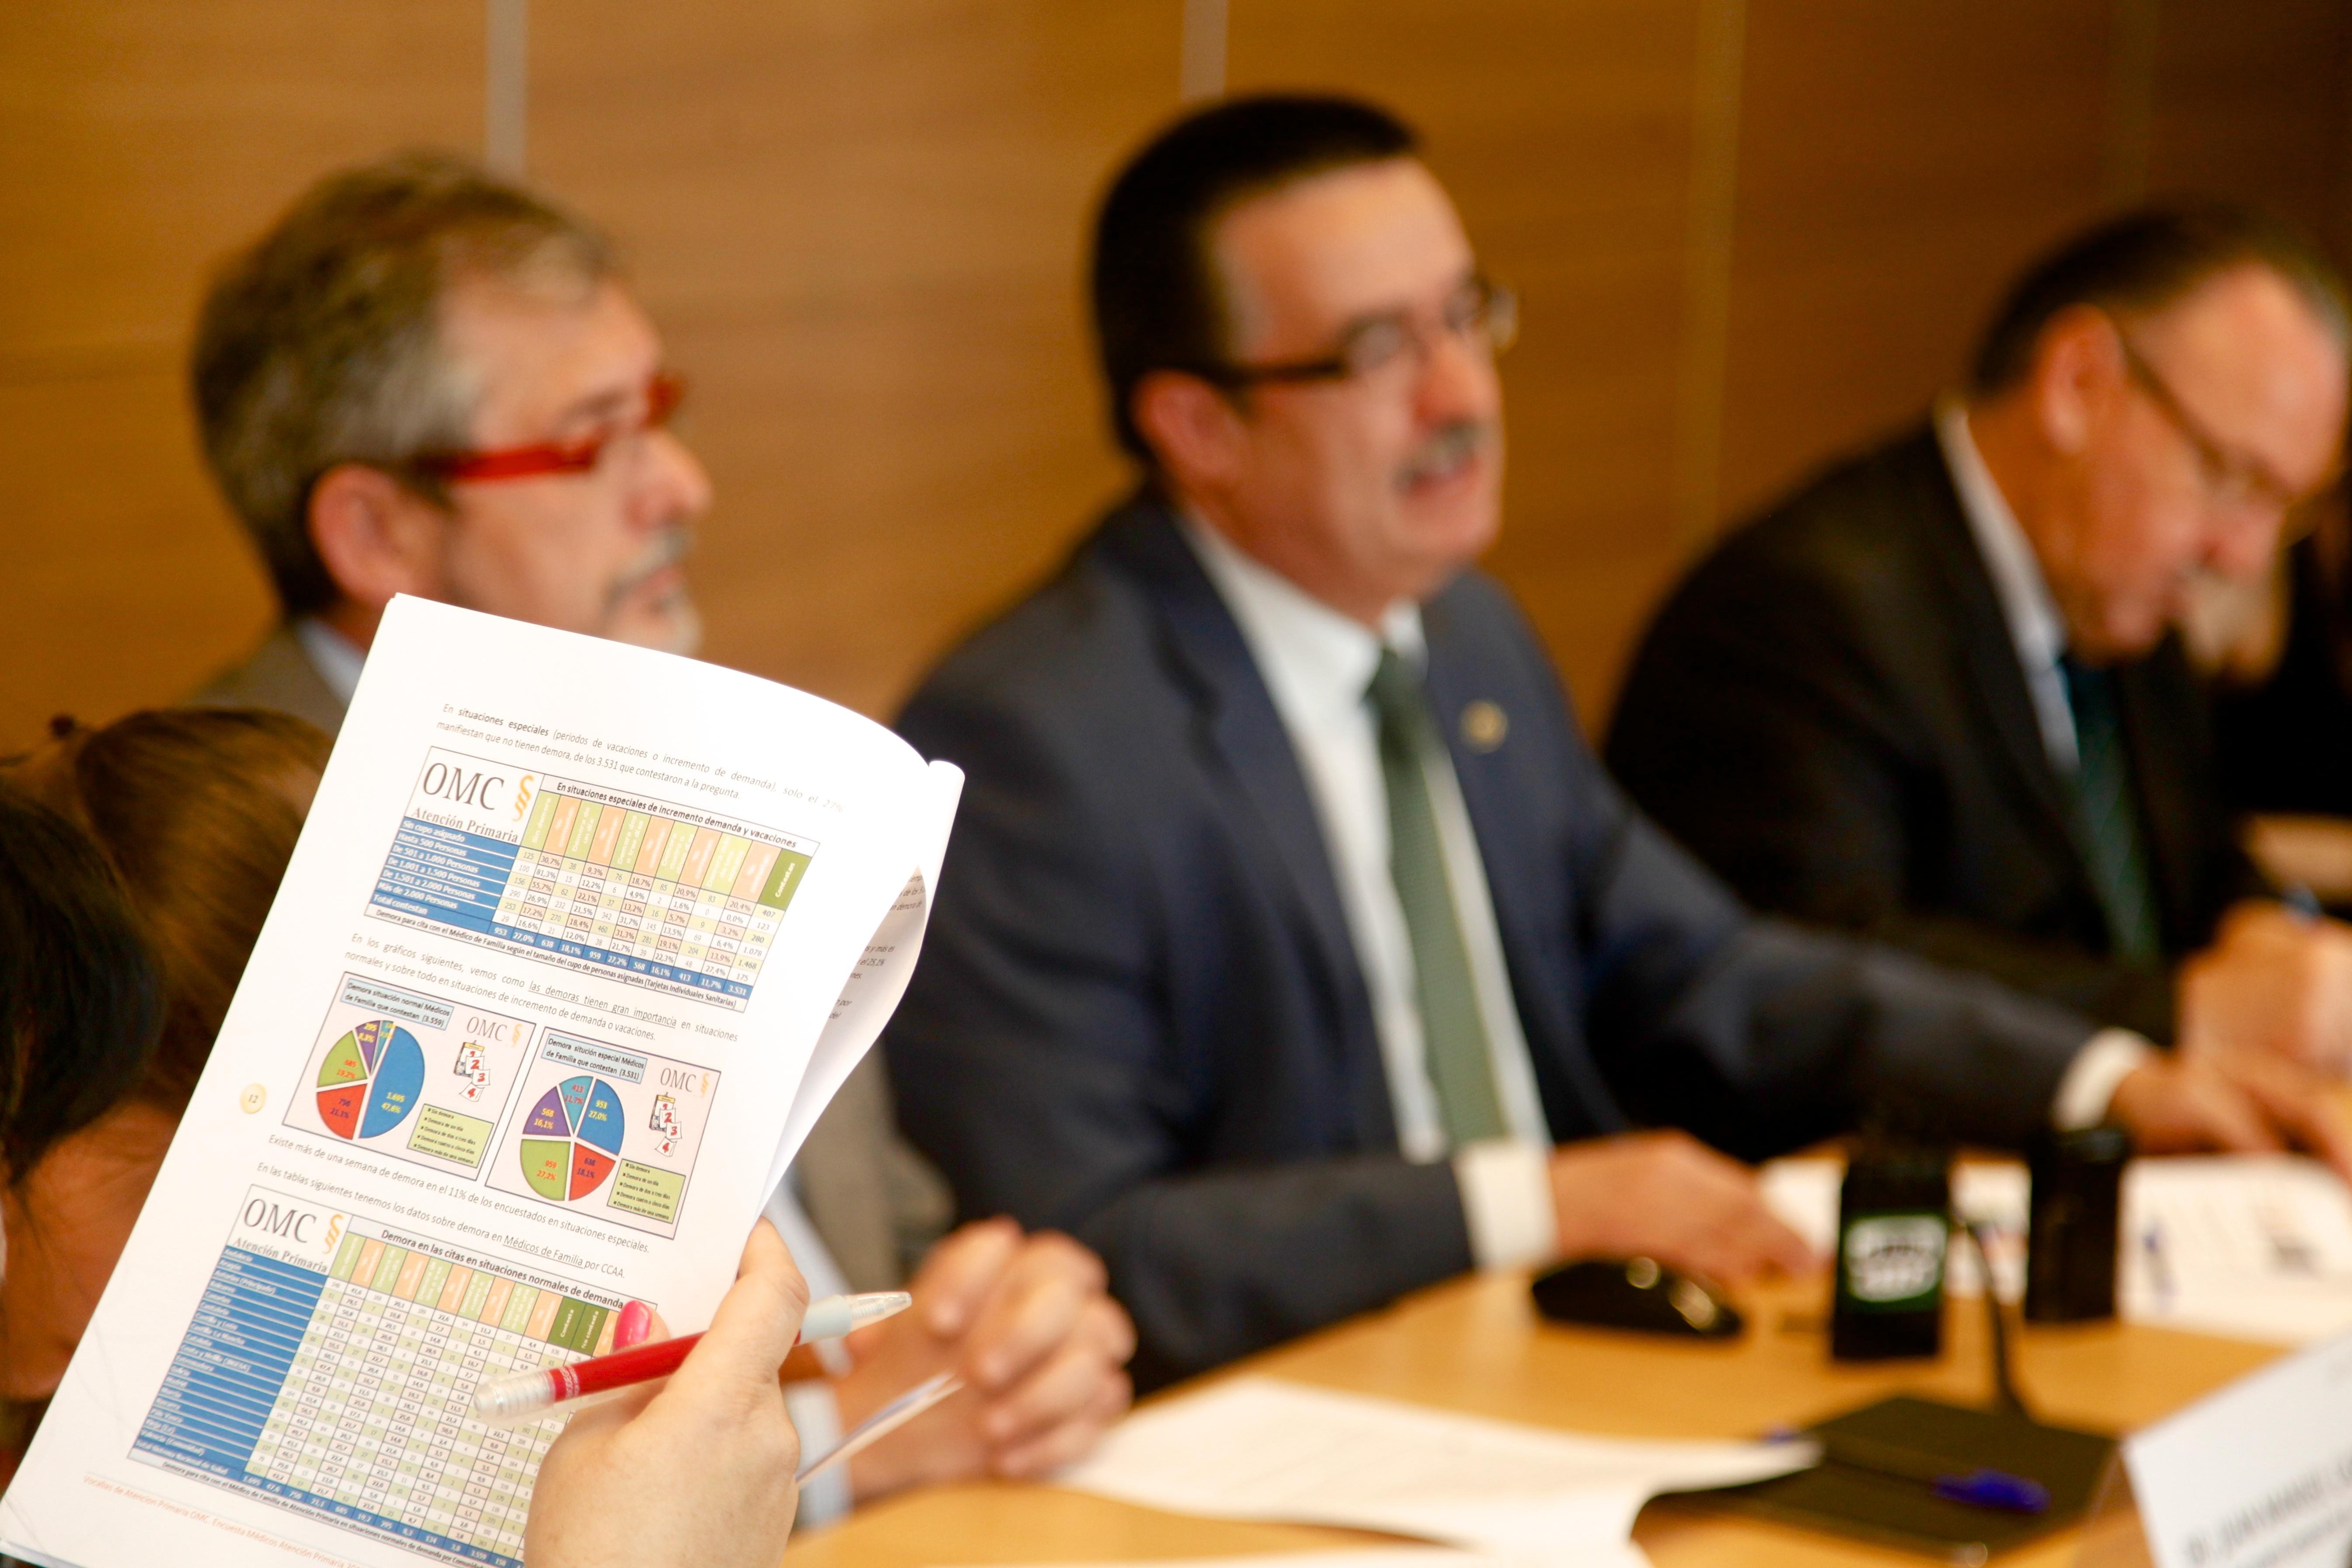 Tres memorias para la próxima Asamblea de la OMC